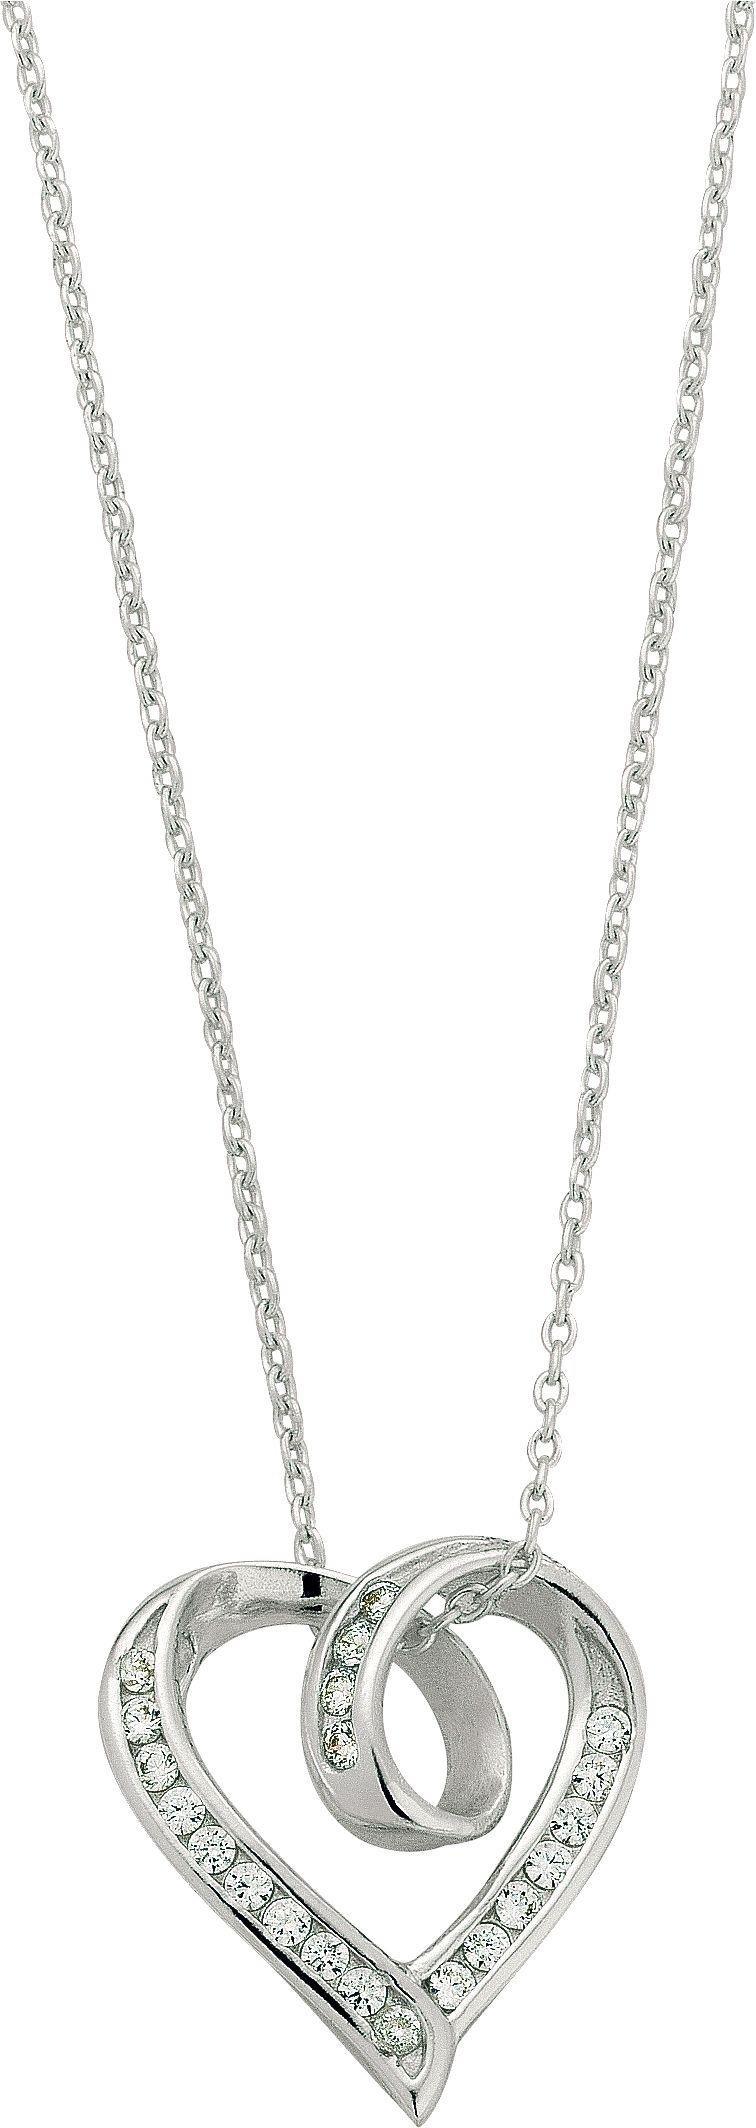 Revere Silver Twist Heart Pendant 18 Inch Necklace